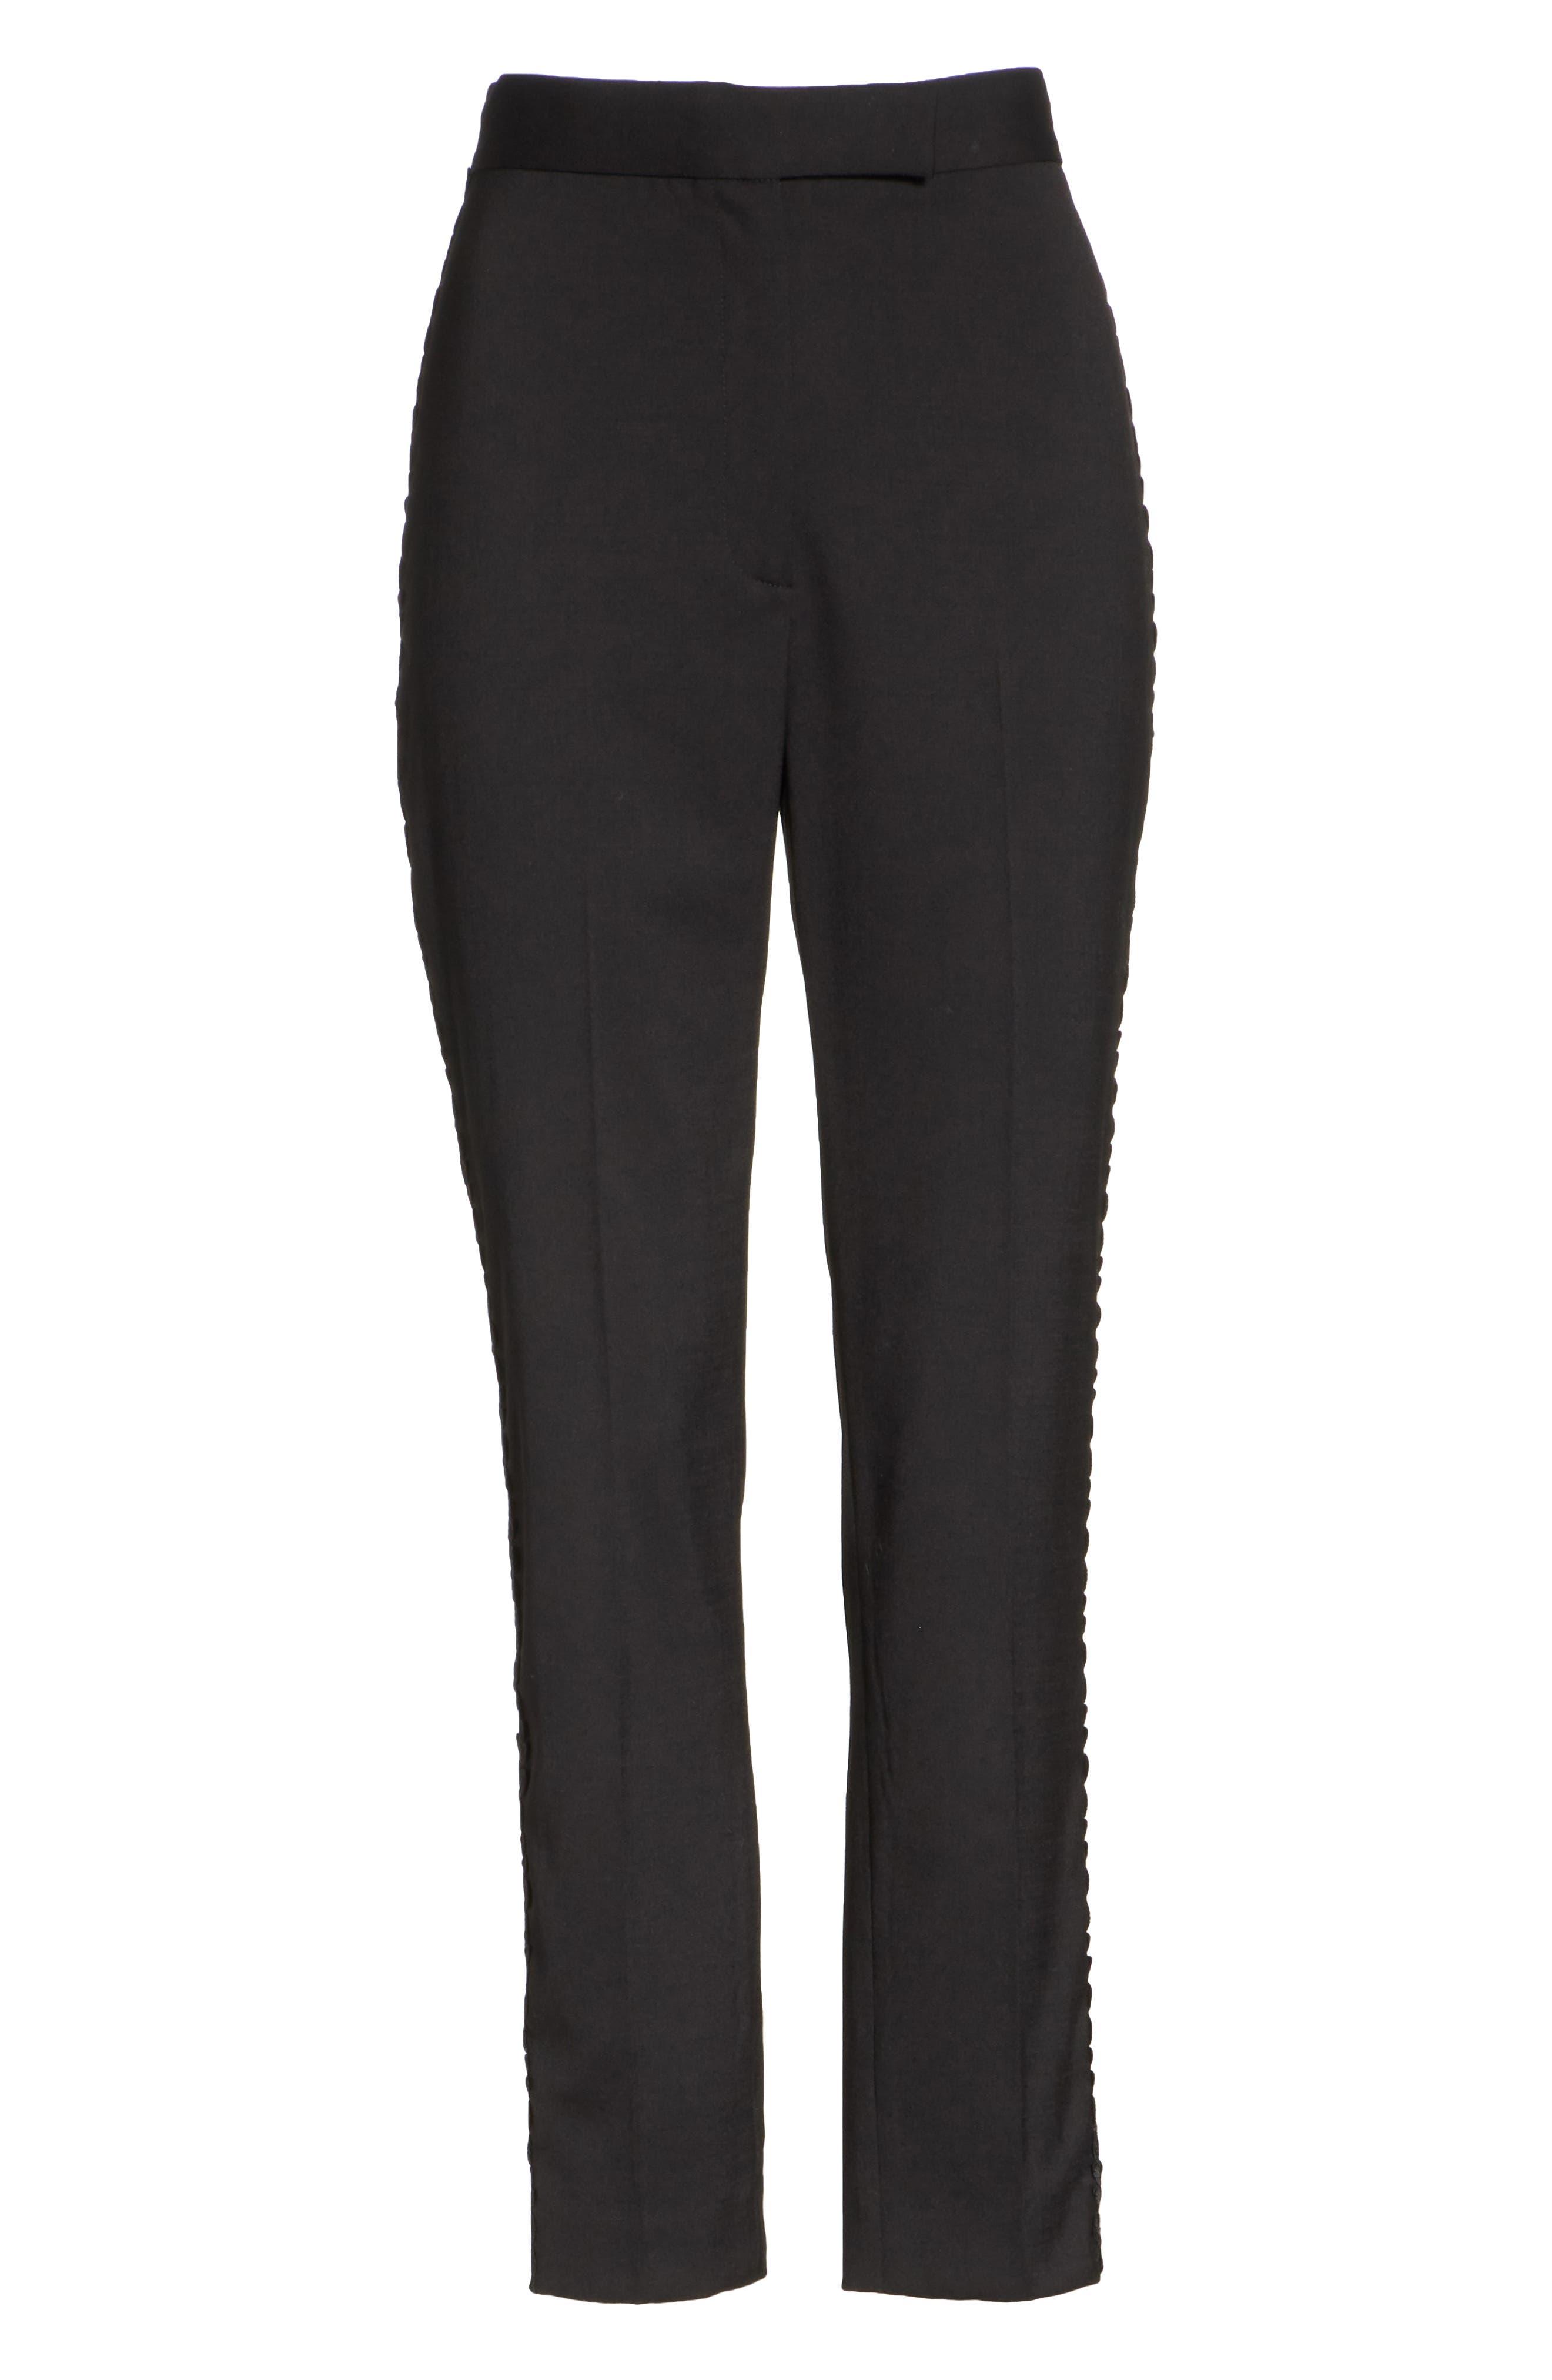 Flower Trim Italian Stretch Wool Pants,                             Alternate thumbnail 6, color,                             Black